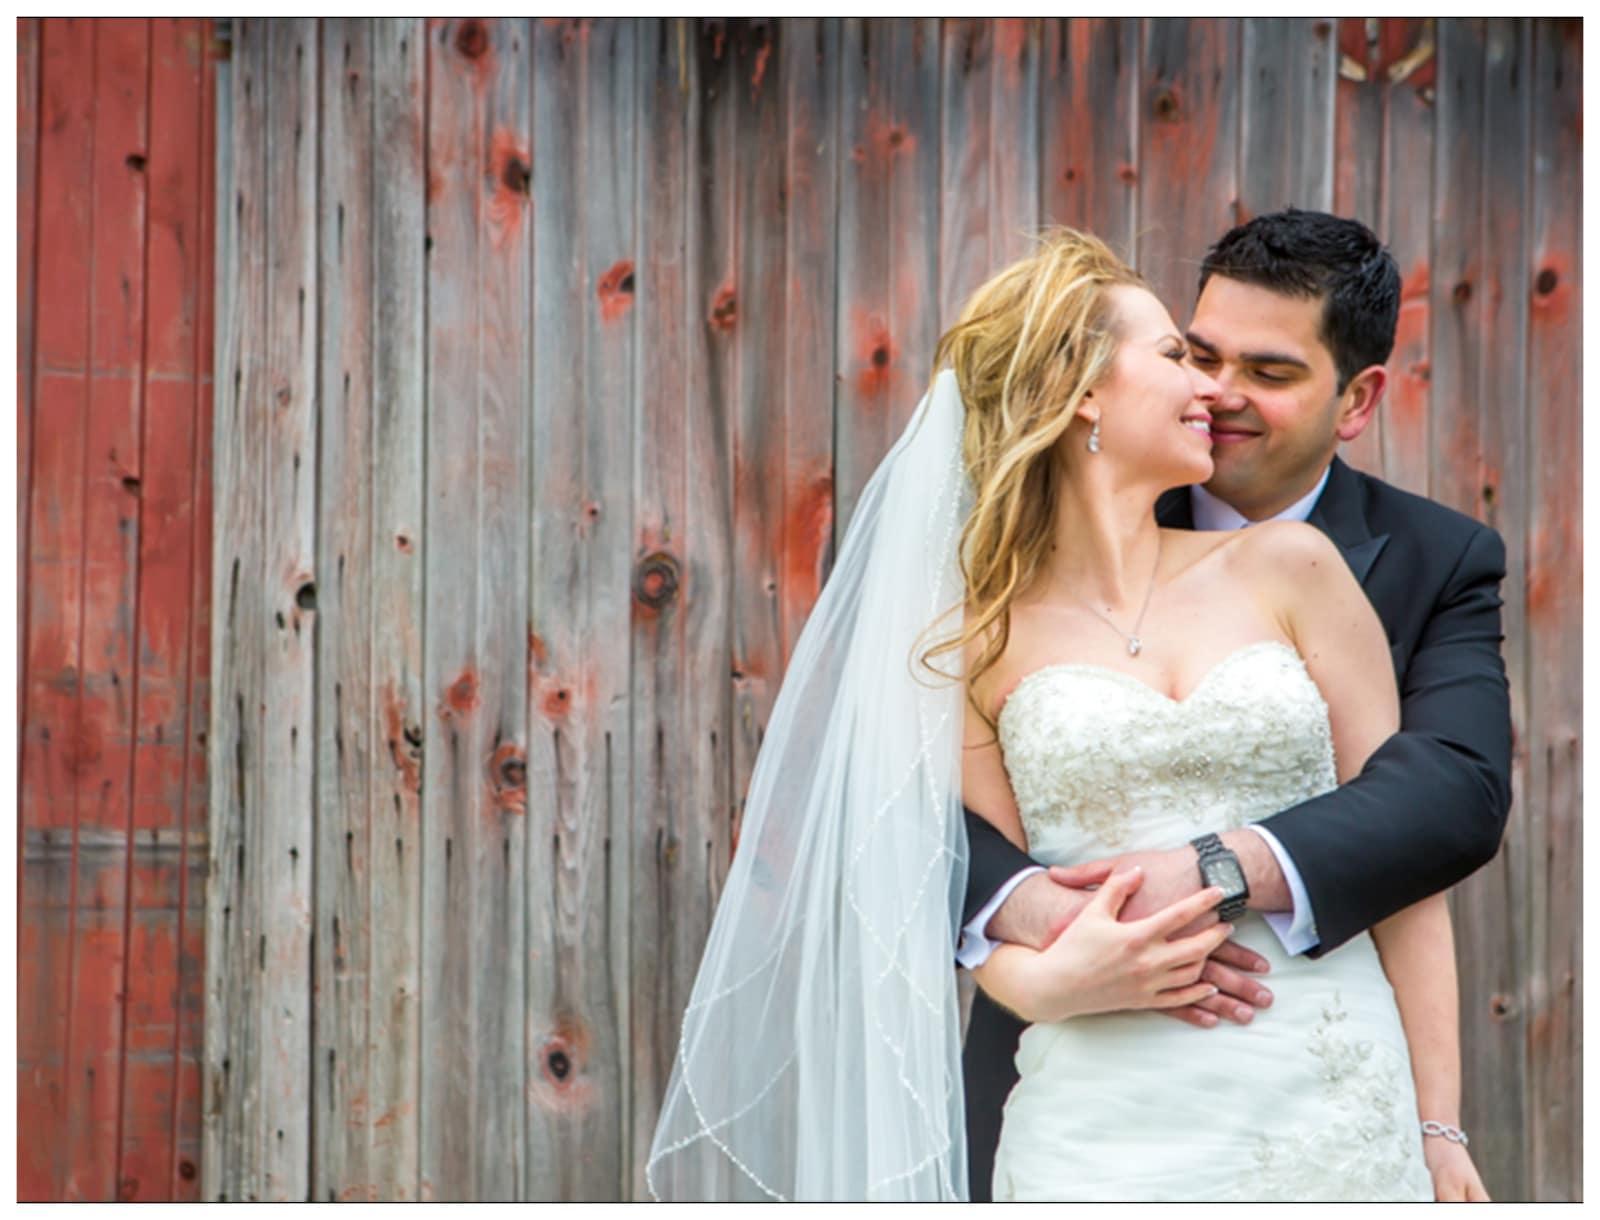 Milton Teatro & Piper's Heath Wedding Photos: Lelja & Mike